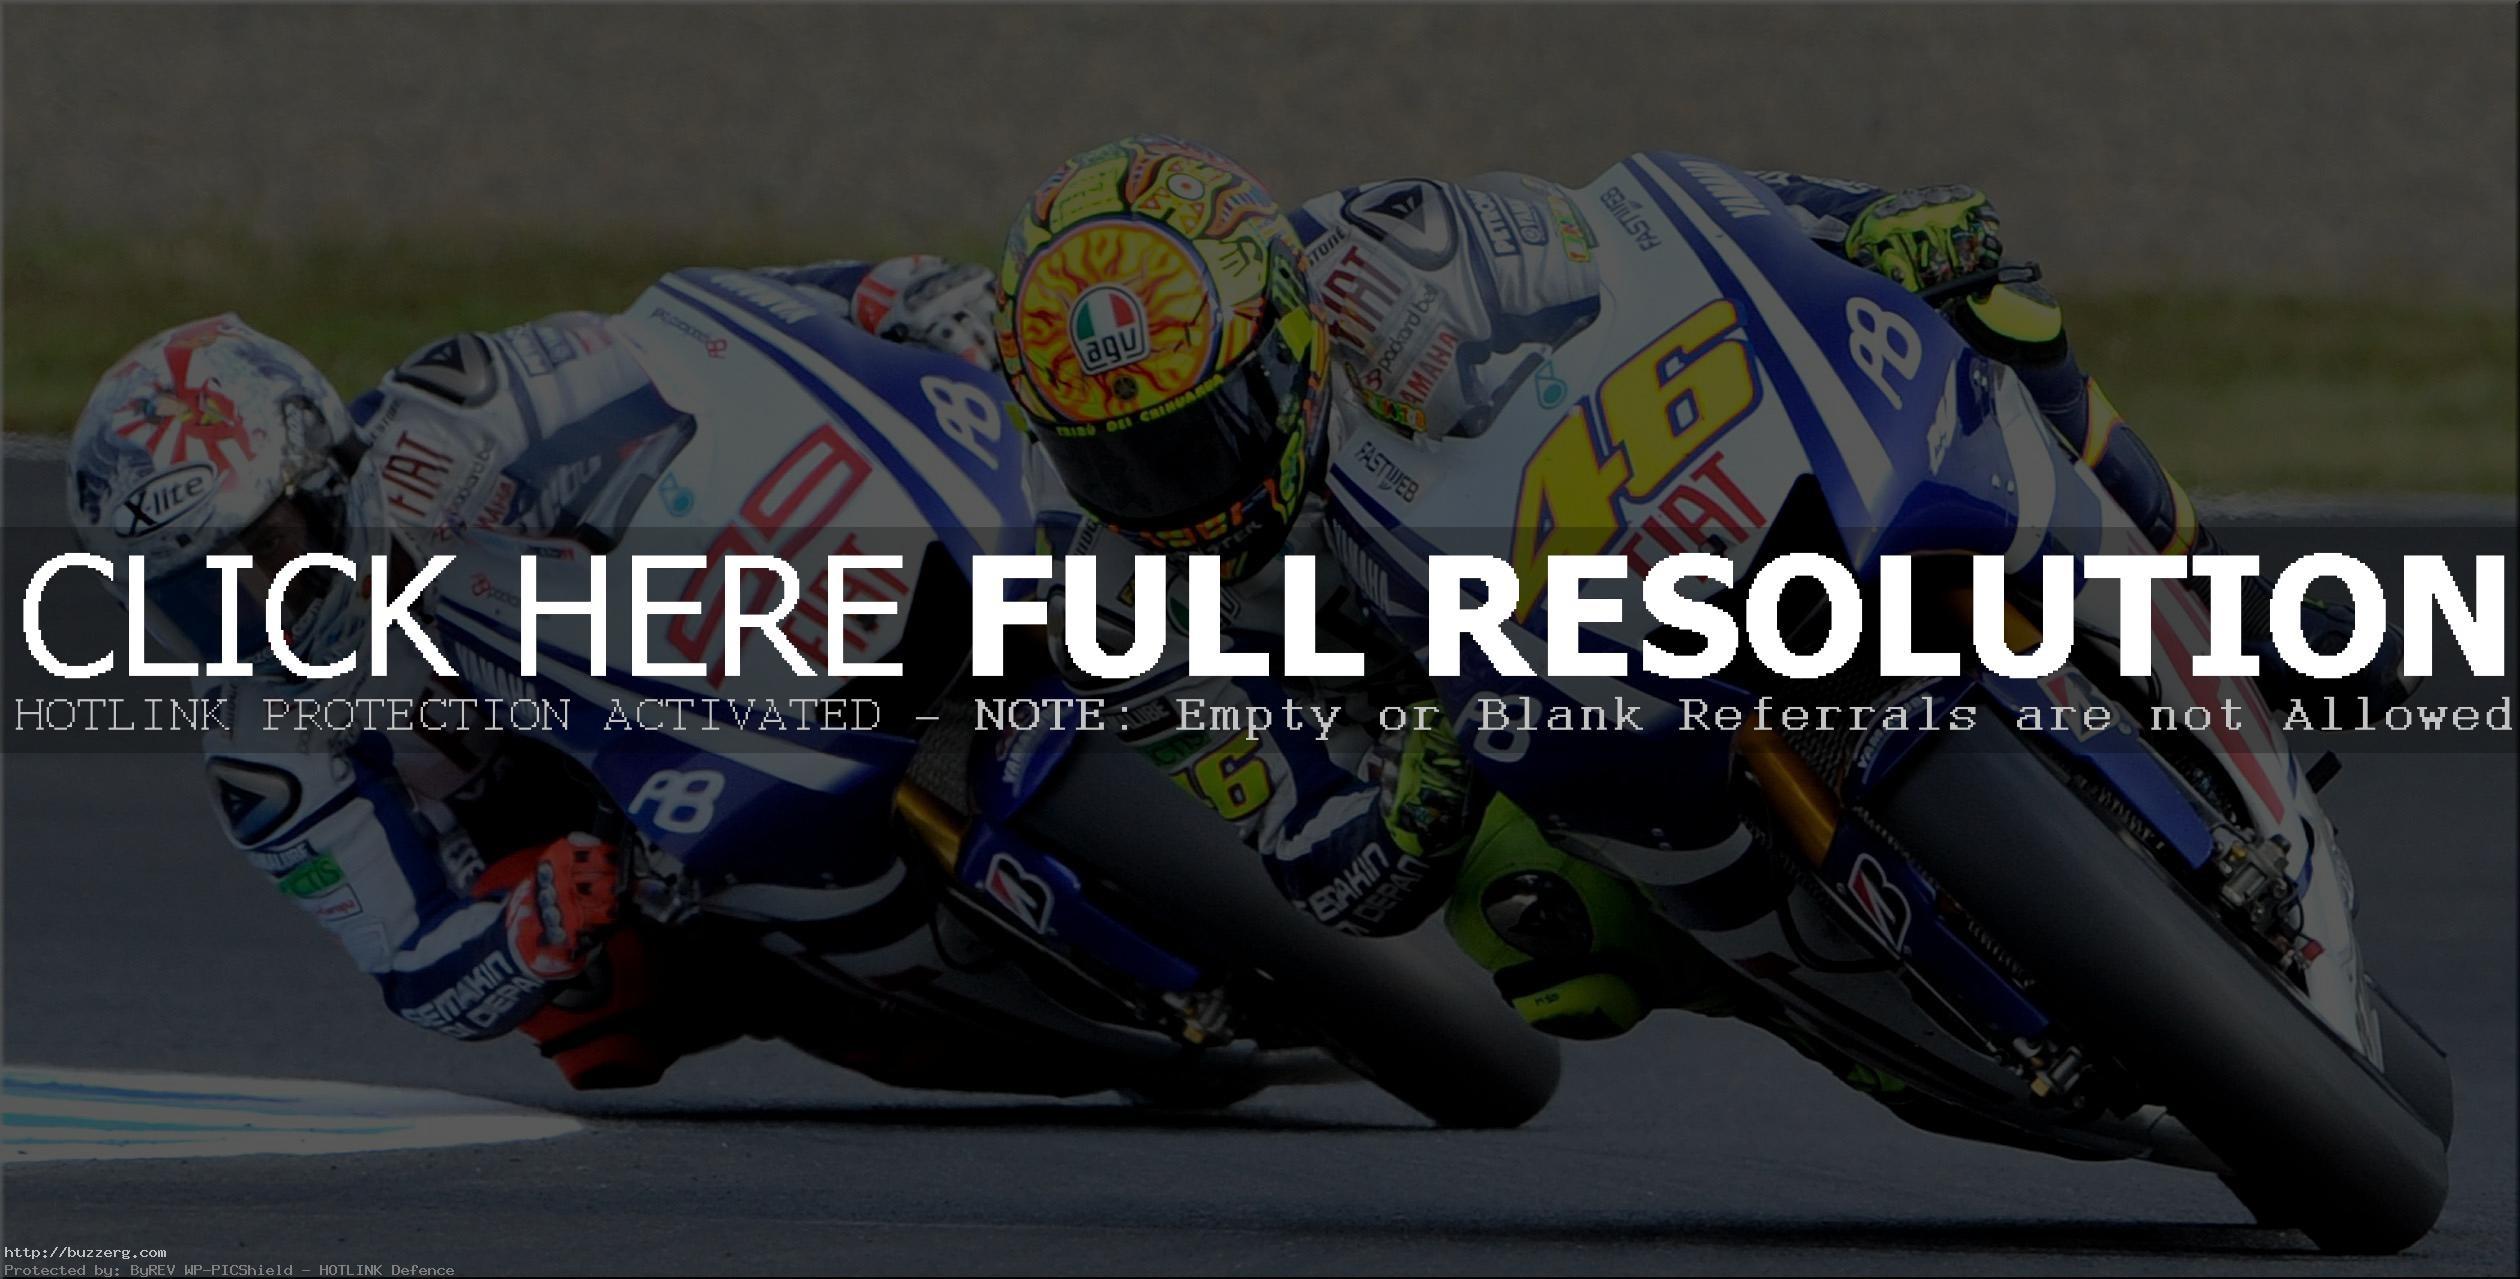 Yamaha Motogp 2013 (id: 21210)